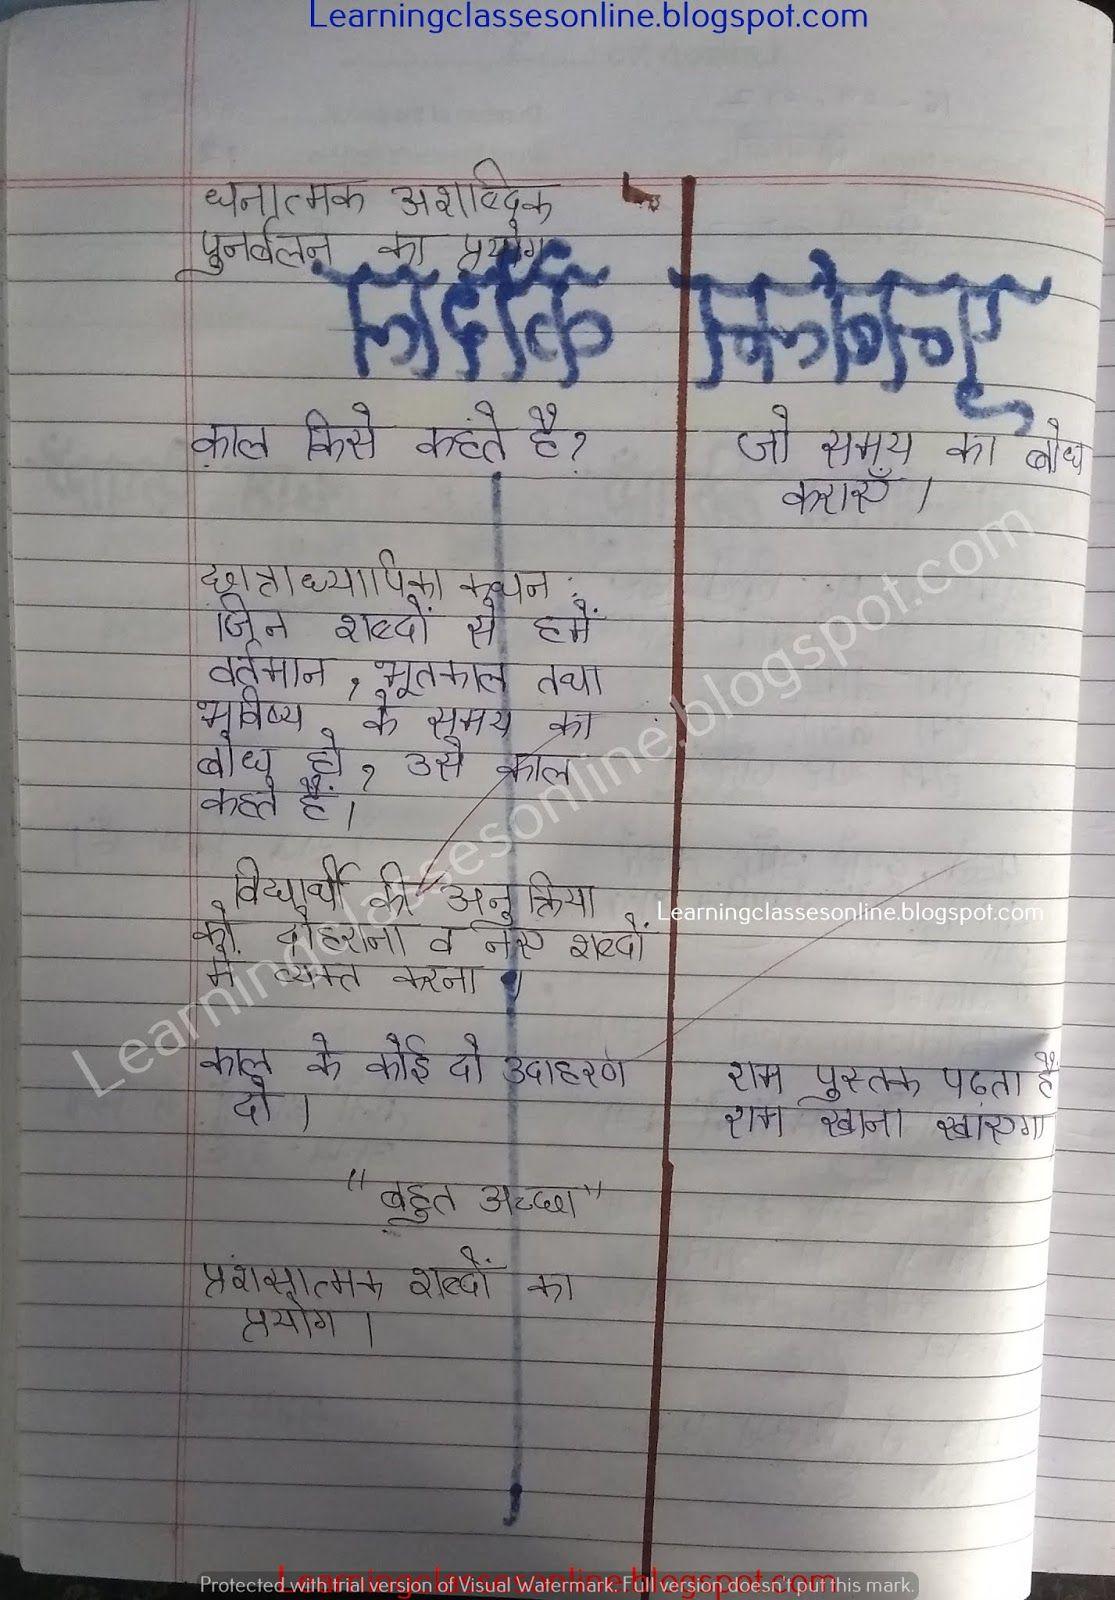 Suksham Shikshan Hindi Grammar Lesson Plan On Kaal Aur Uske Bhed For Class 6 To 10 Grammar Lesson Plans Grammar Lessons Lesson Plan In Hindi [ 1600 x 1115 Pixel ]